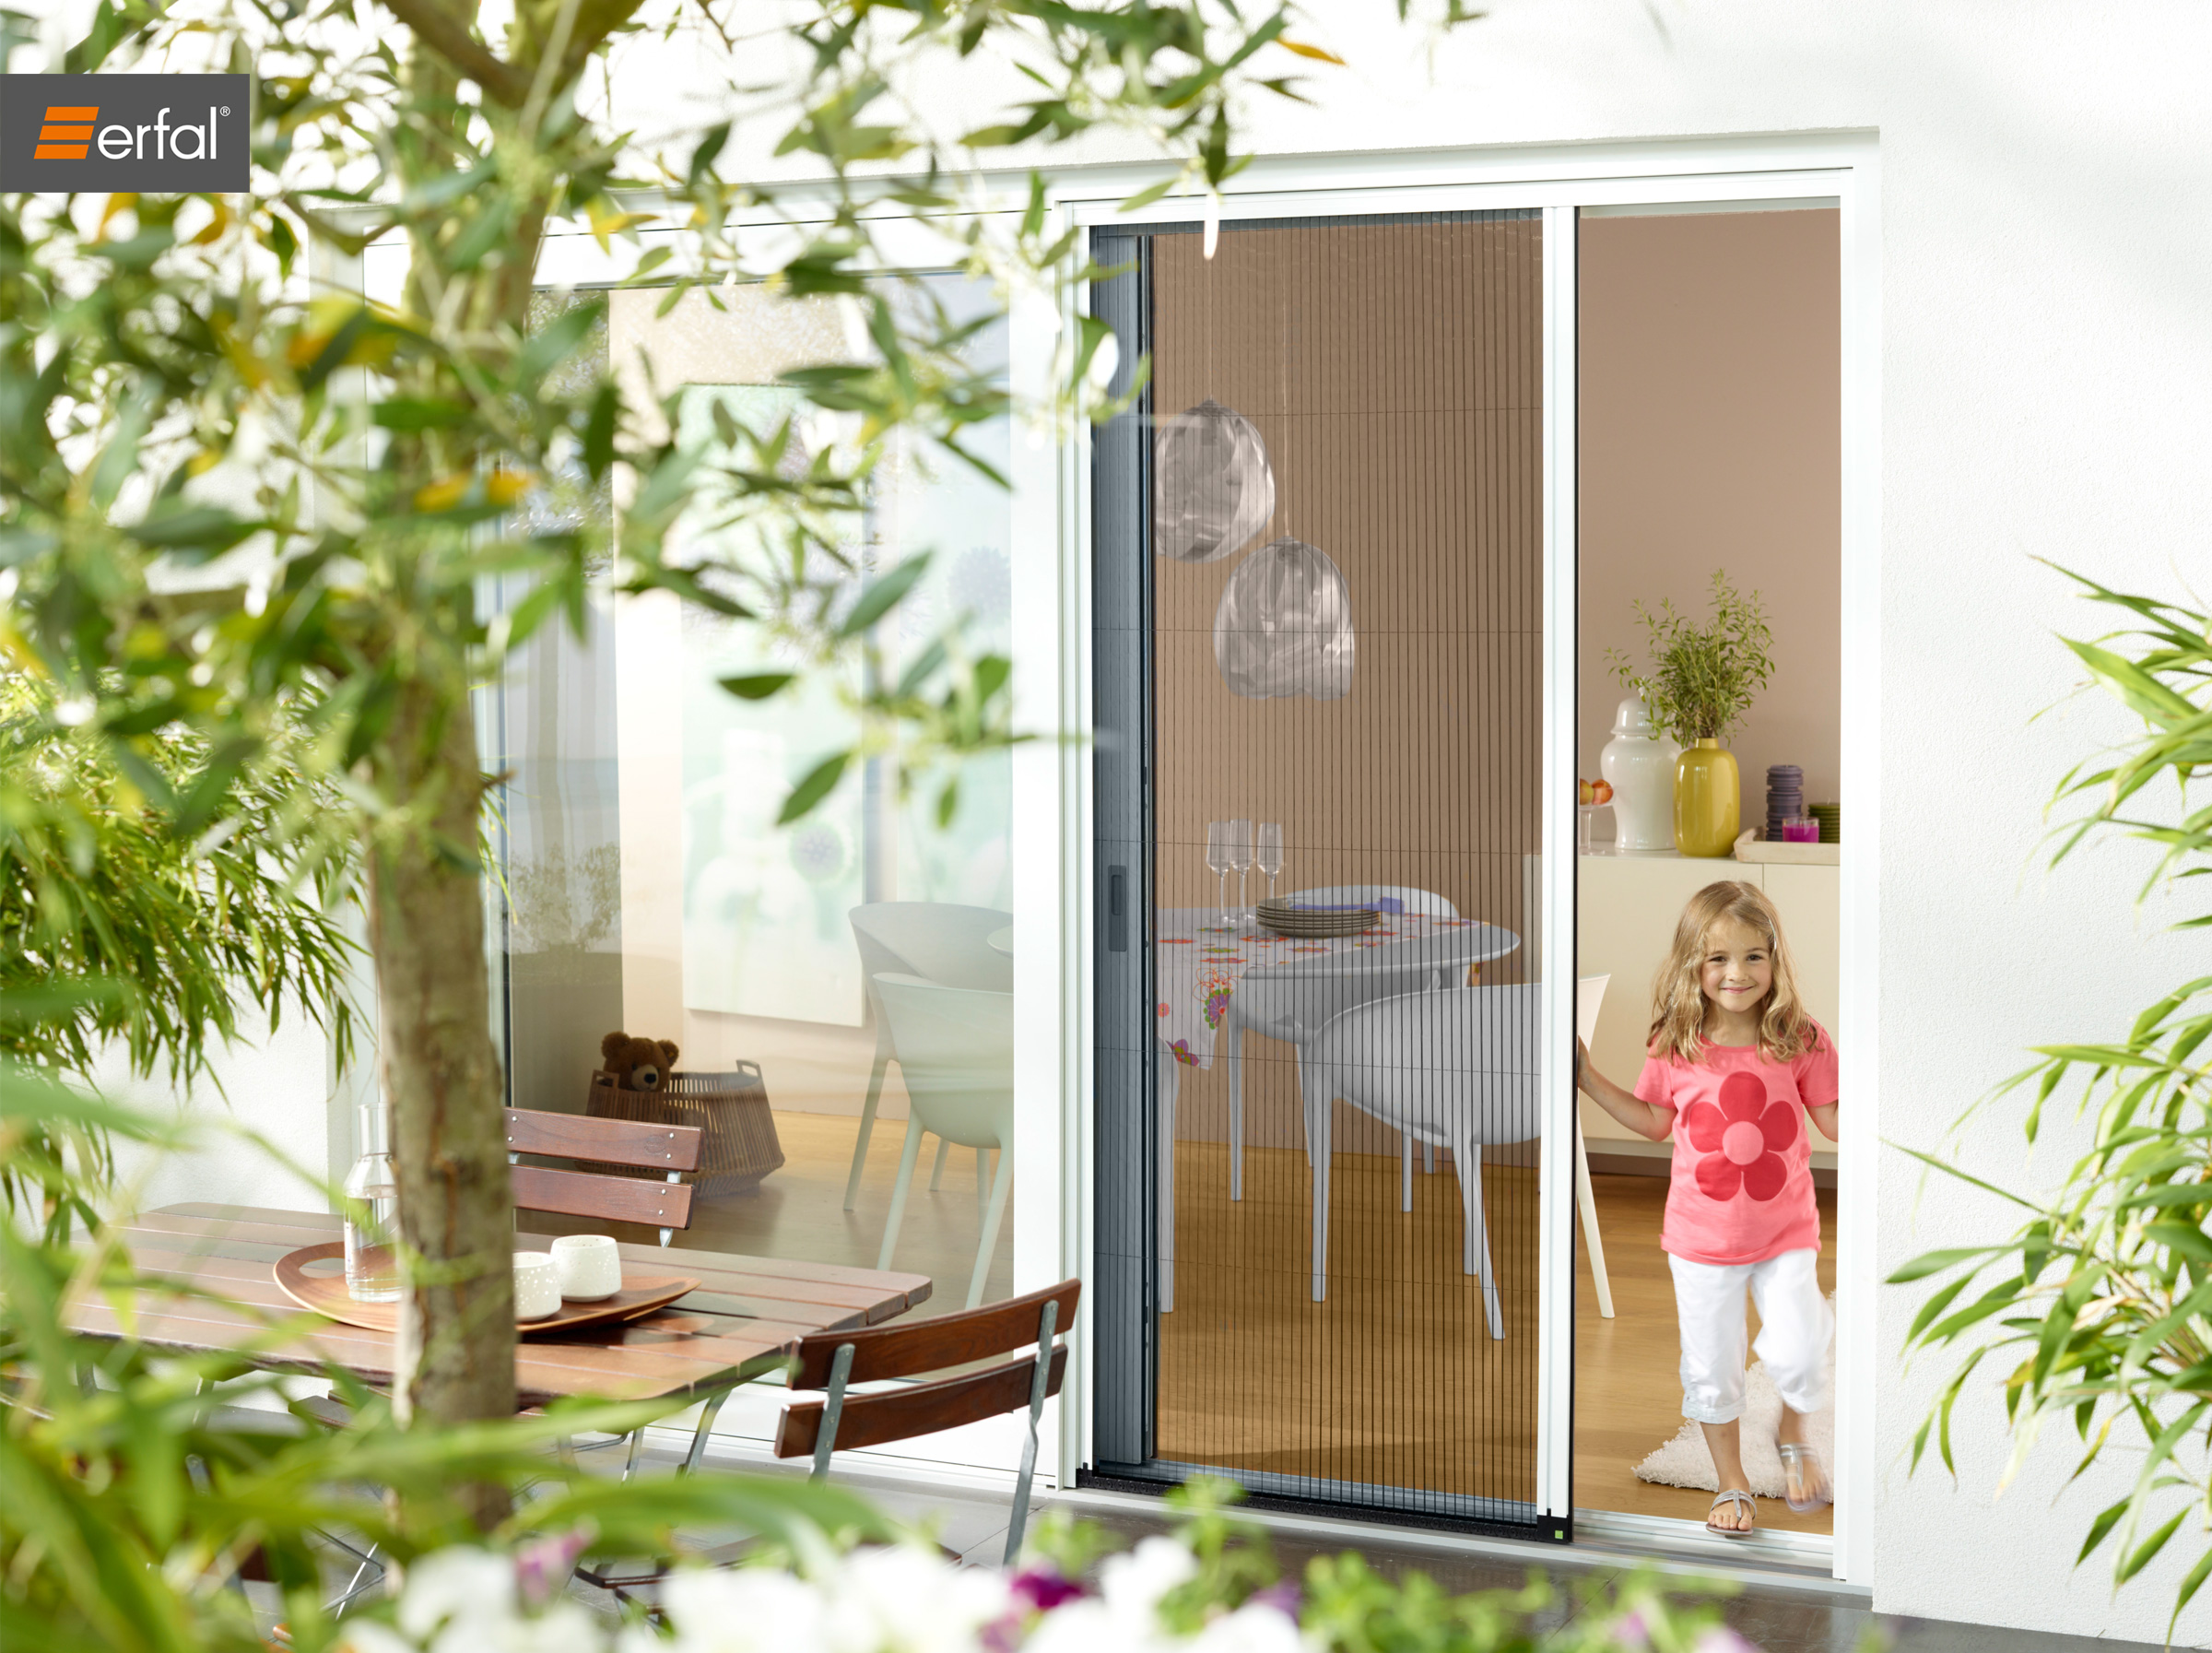 insektenschutzvorh nge rothaupt raumausstatter. Black Bedroom Furniture Sets. Home Design Ideas